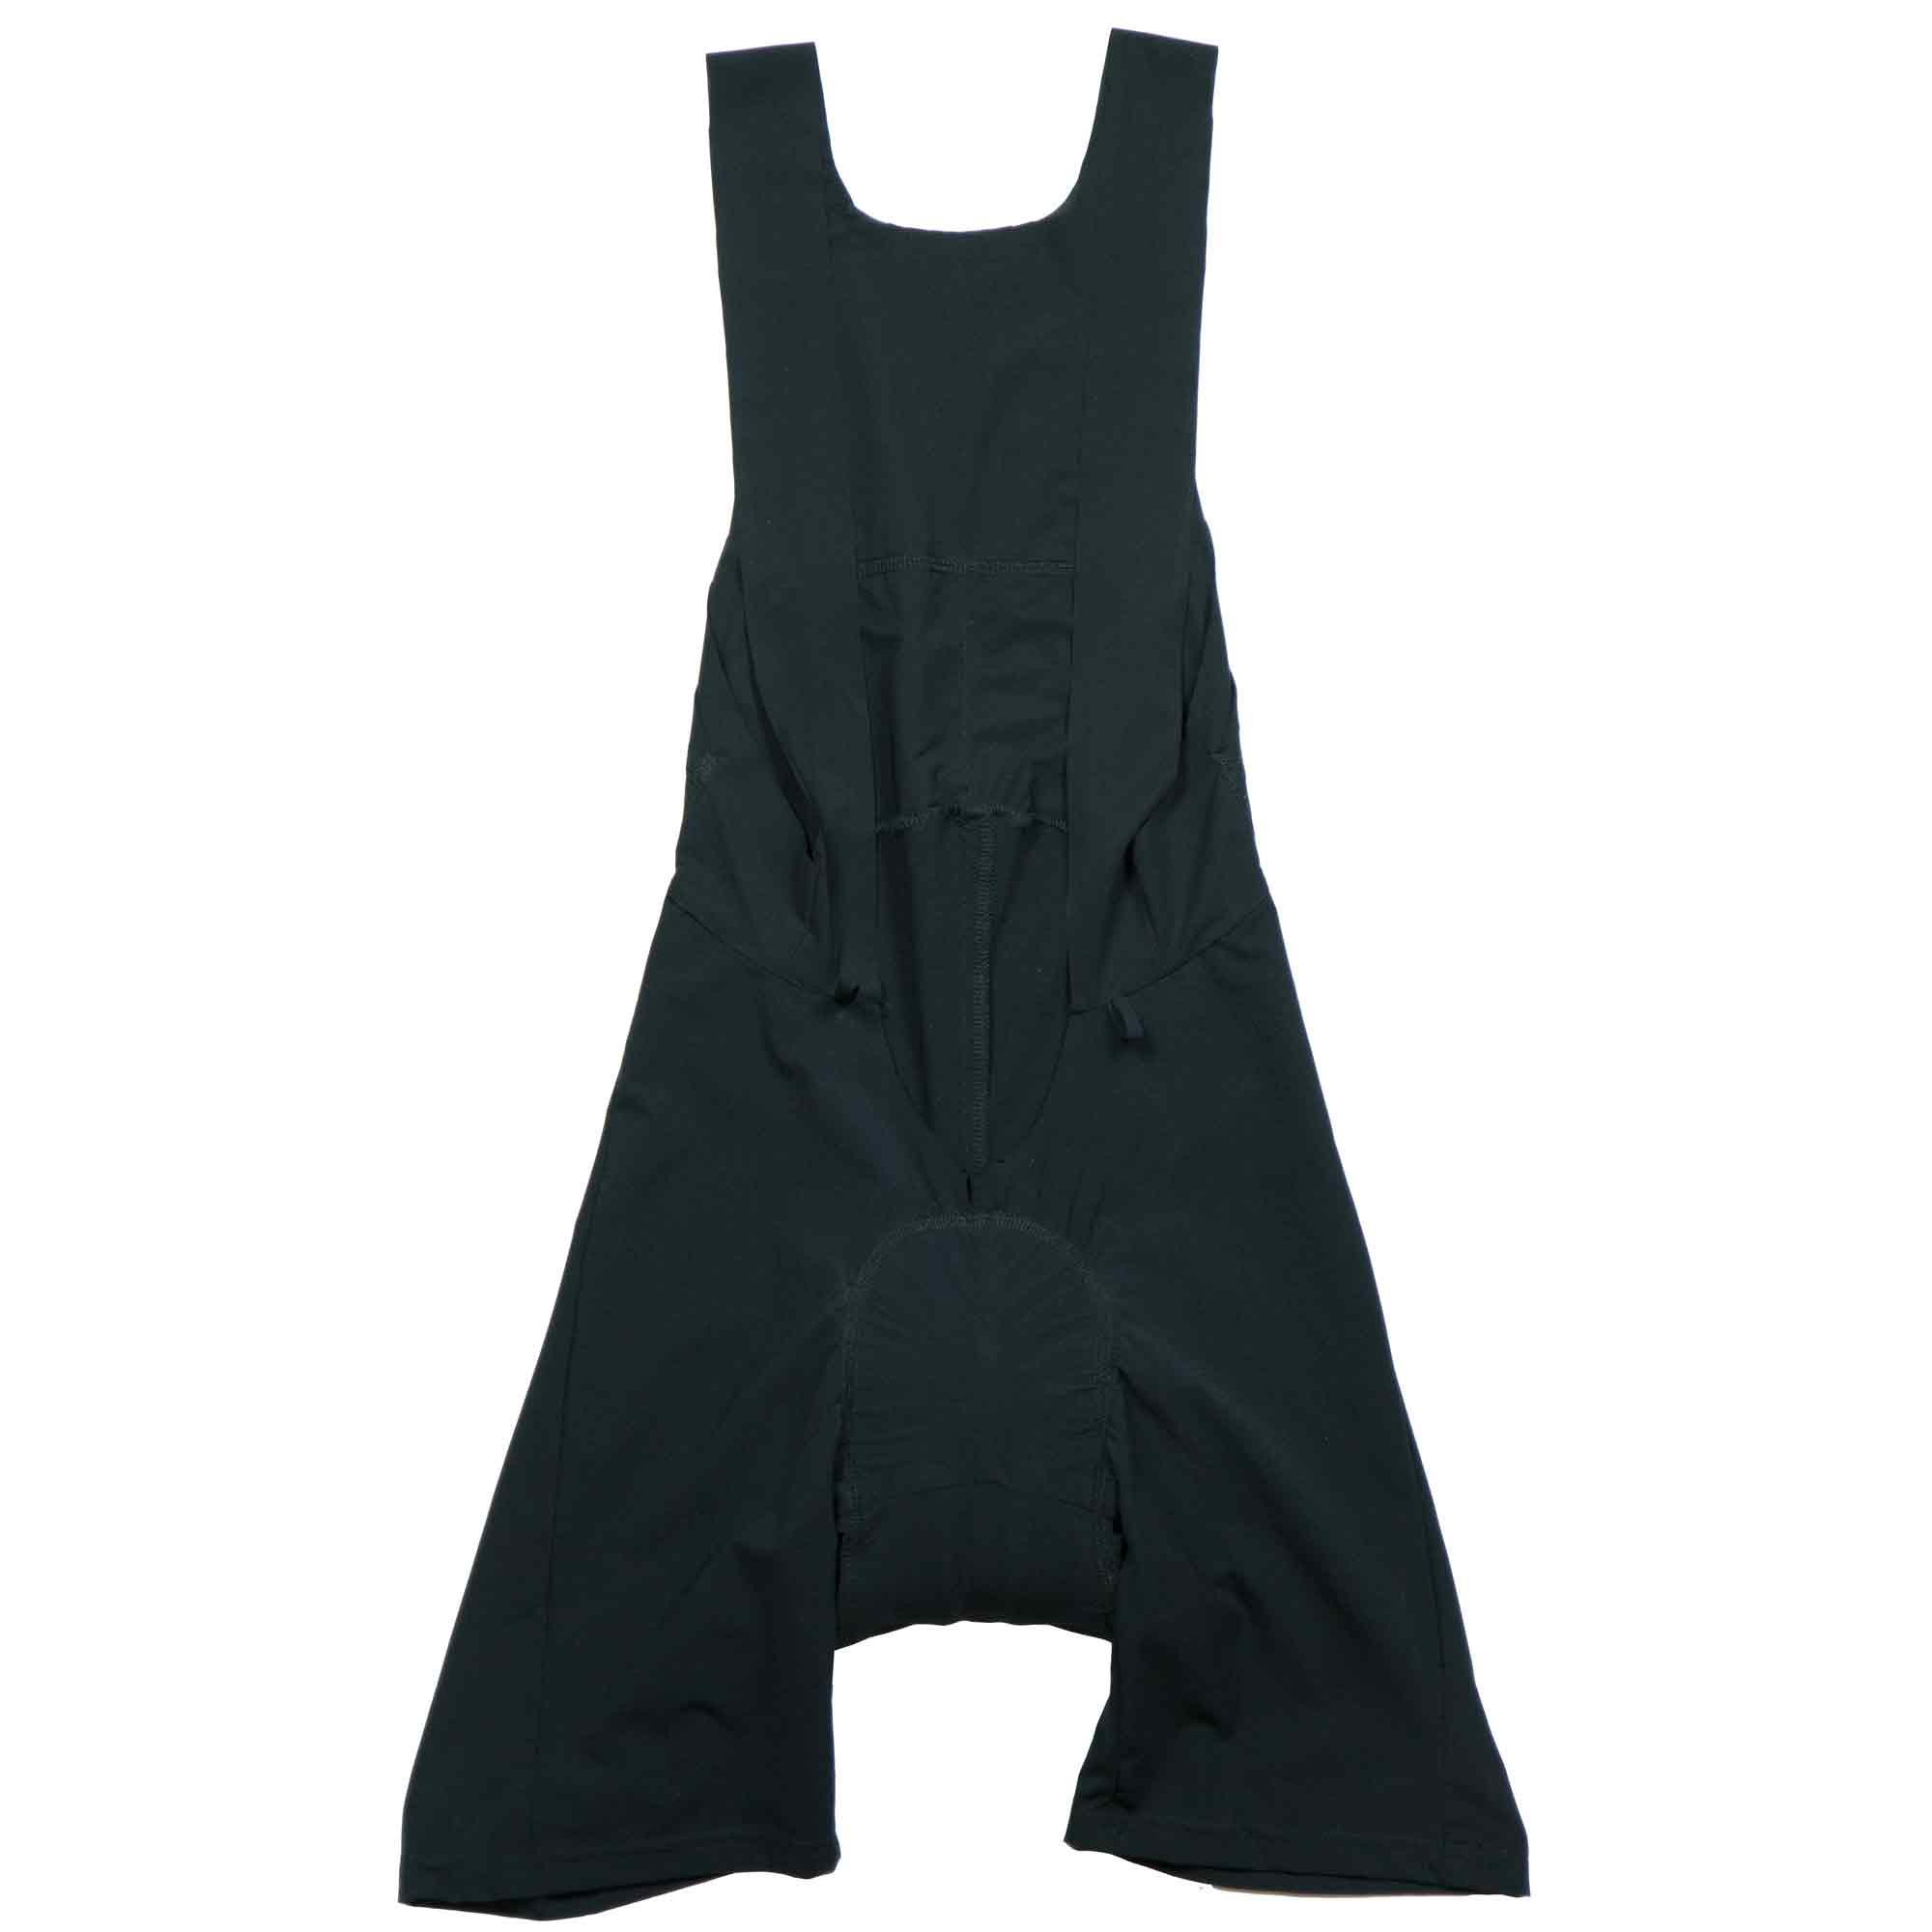 Synthetic off-road bib shorts